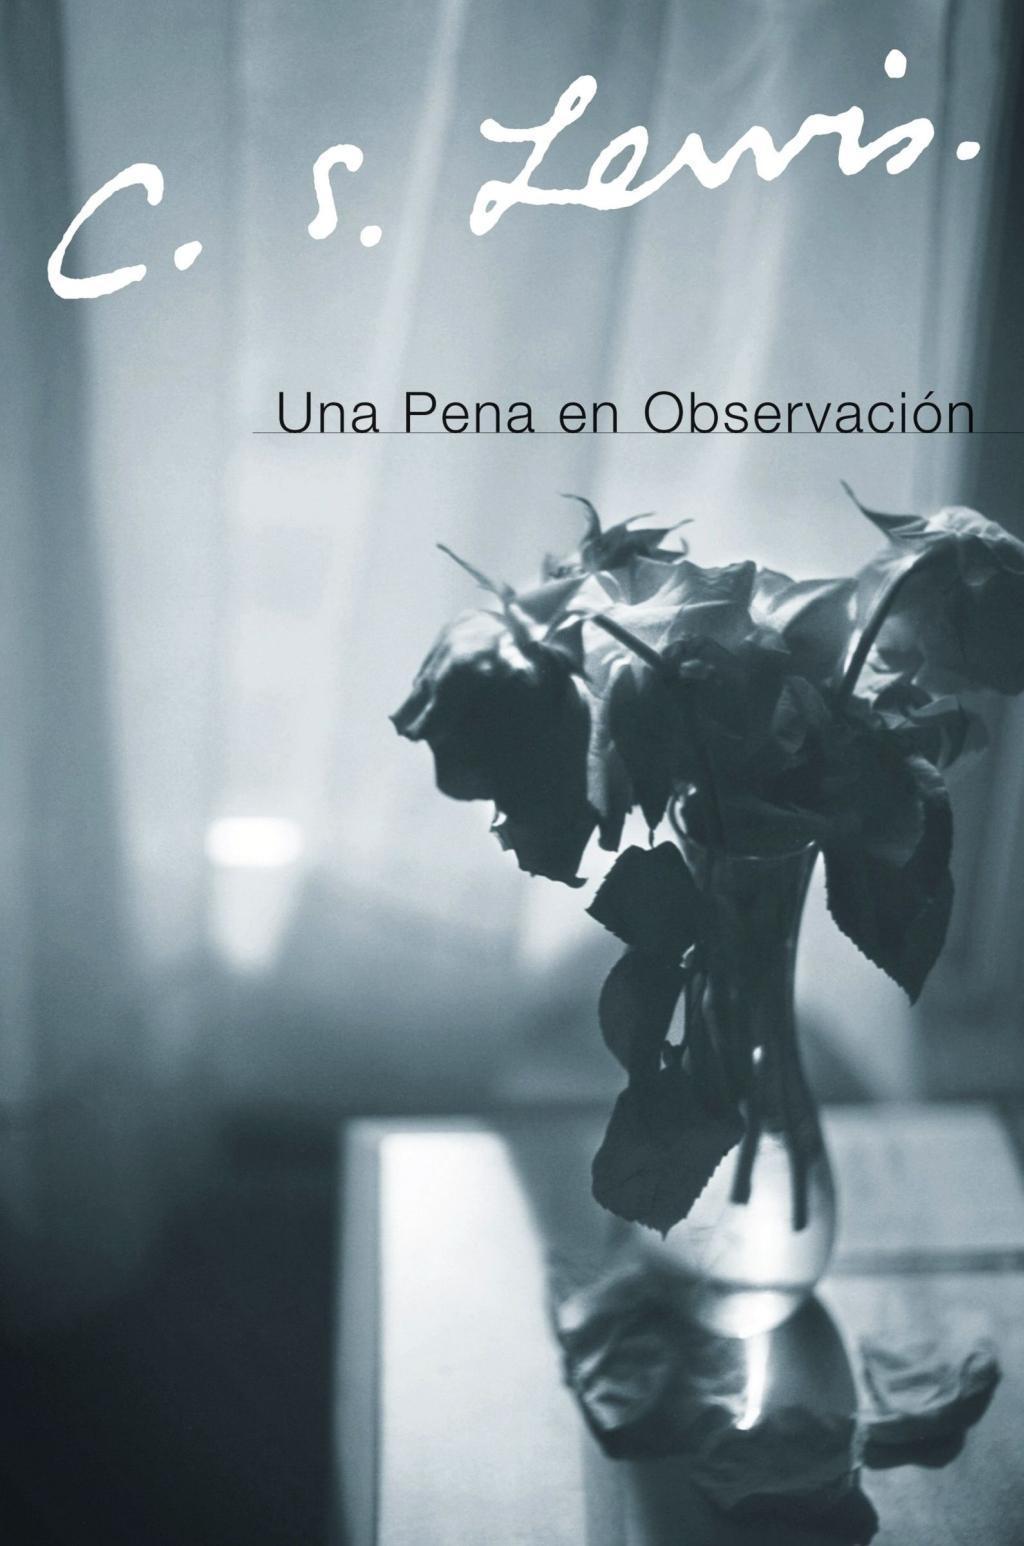 Una Pena en Observacion